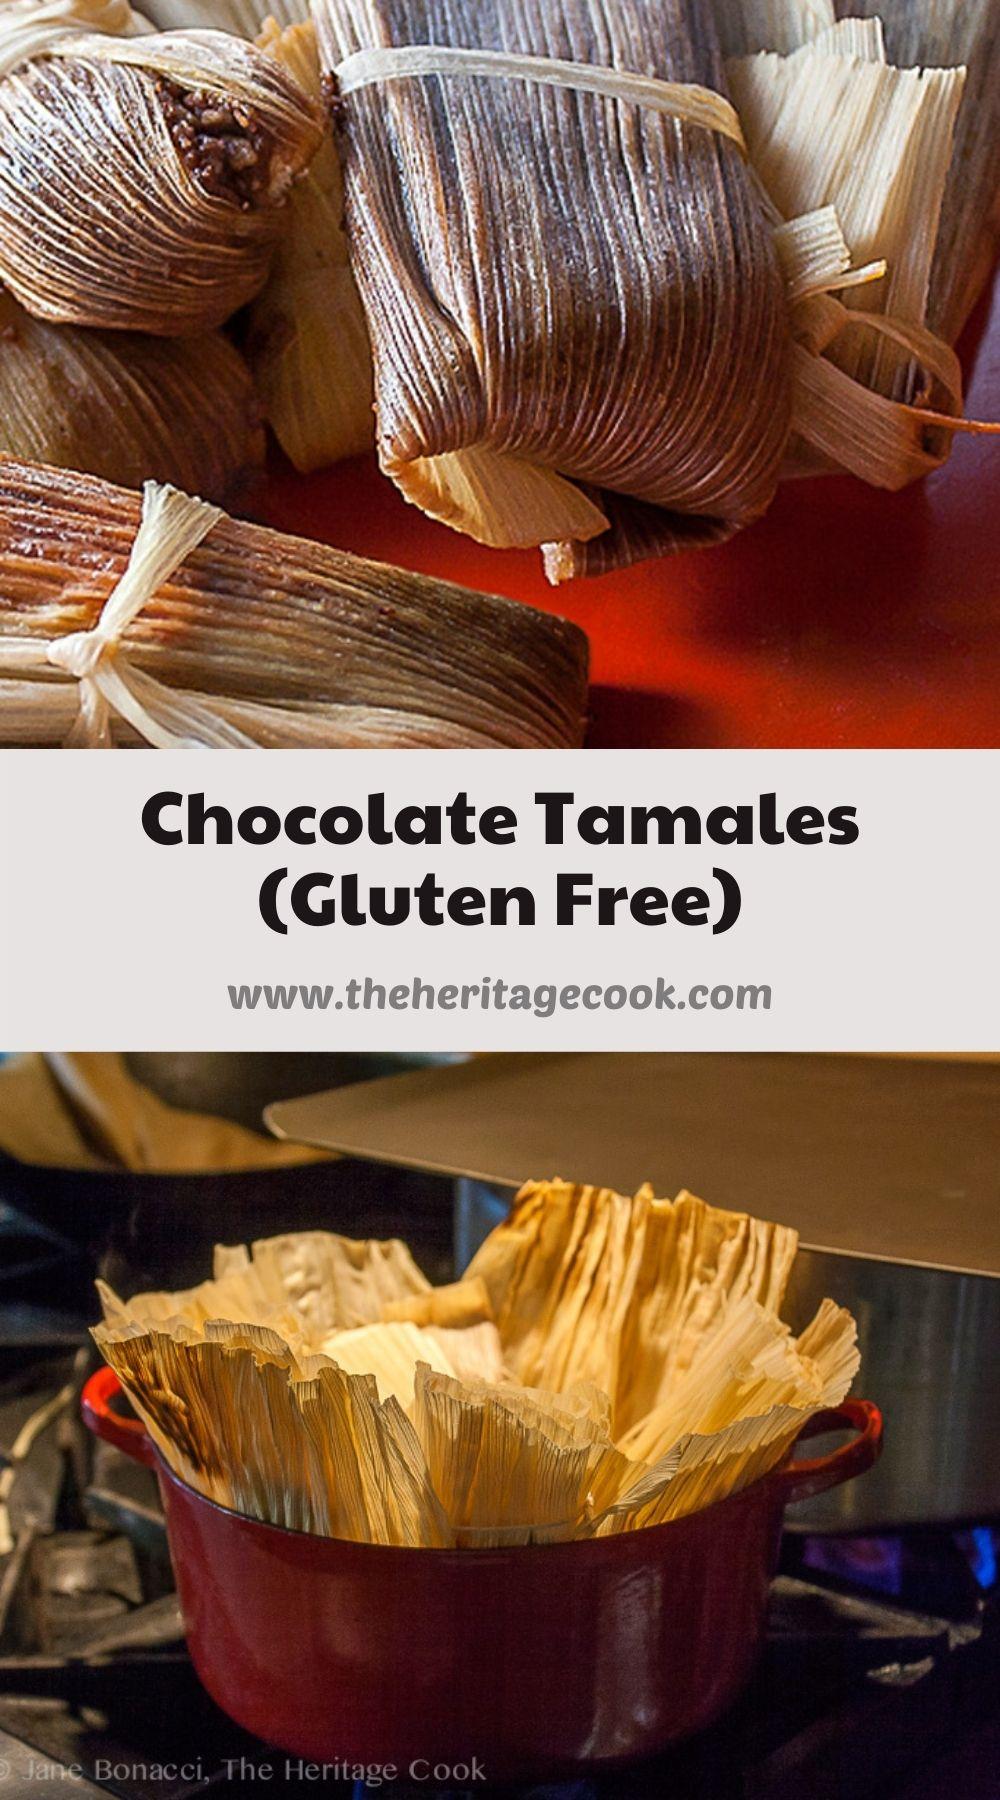 Chocolate Tamales (Gluten Free) © 2020 Jane Bonacci, The Heritage Cook